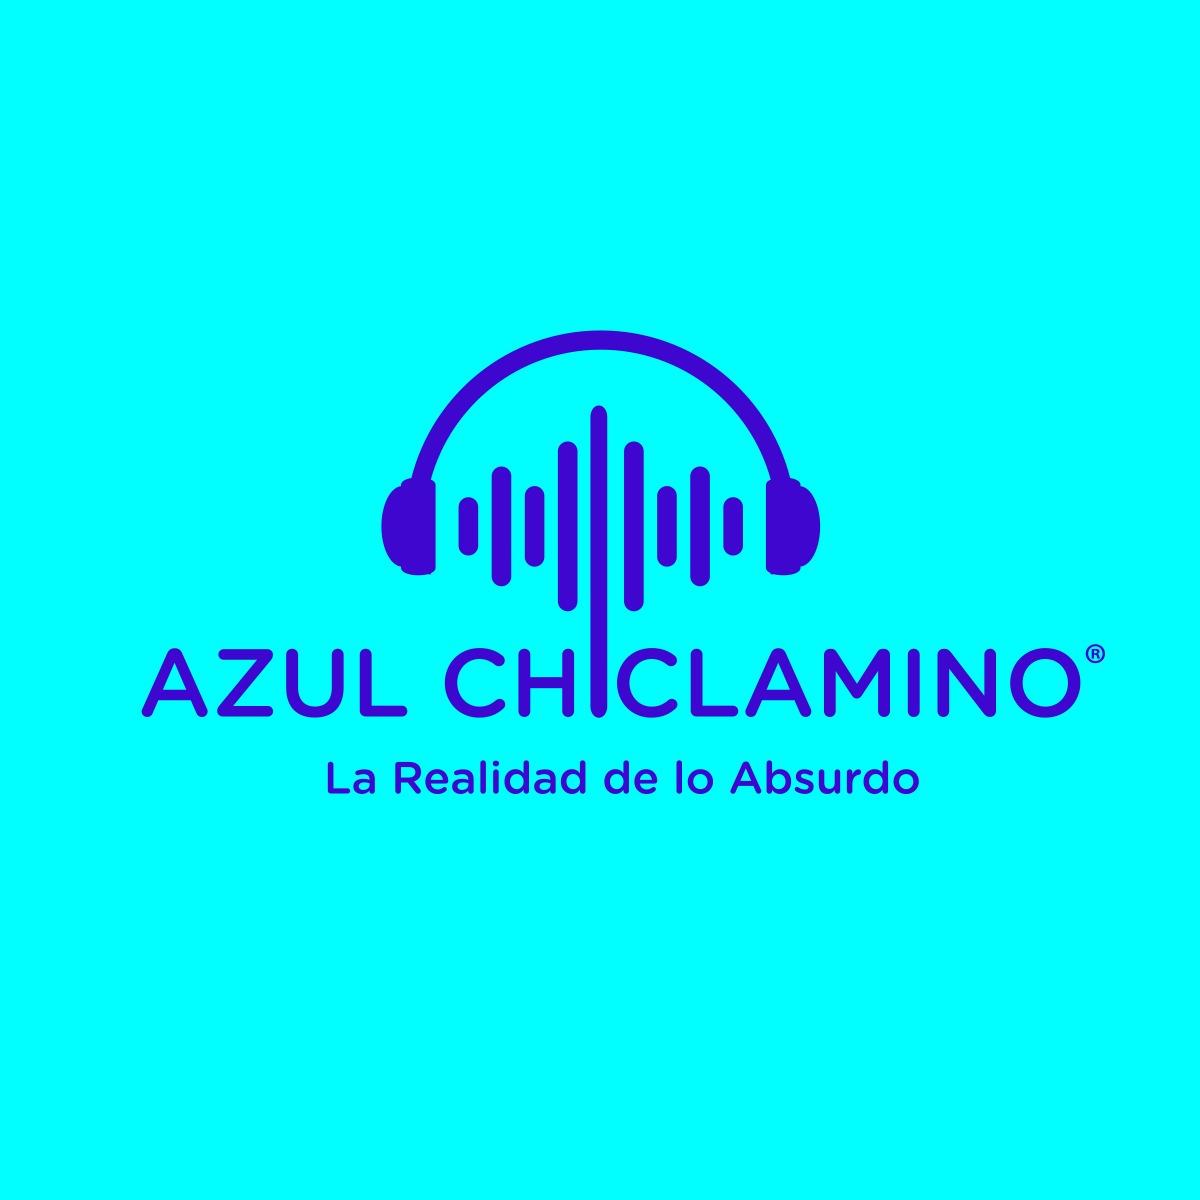 Azul Chiclamino Logo.jpeg